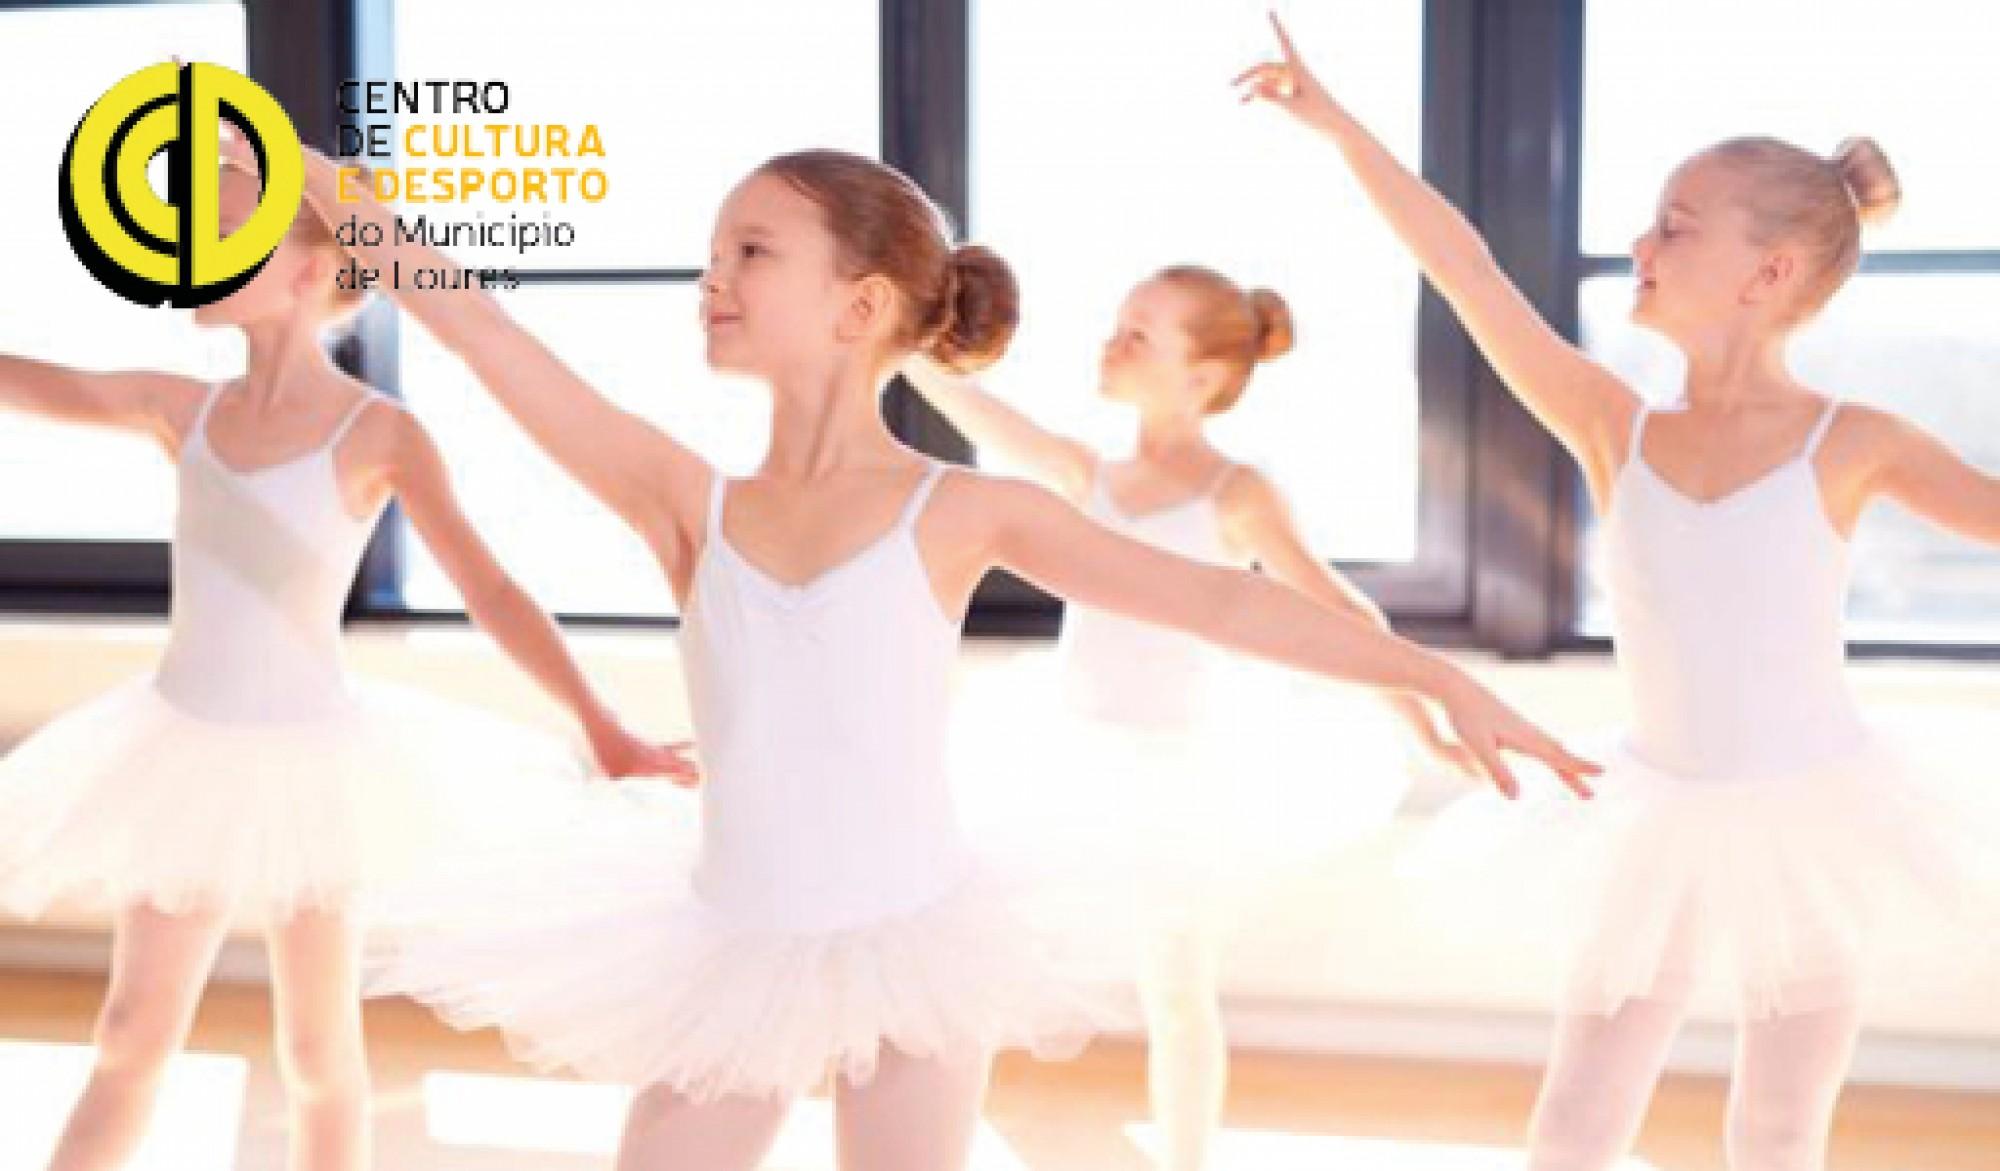 a9a5b4f3fd BALLET INFANTIL. Dançar é divertido! O Ballet Clássico. O ballet clássico  consiste em unir a técnica